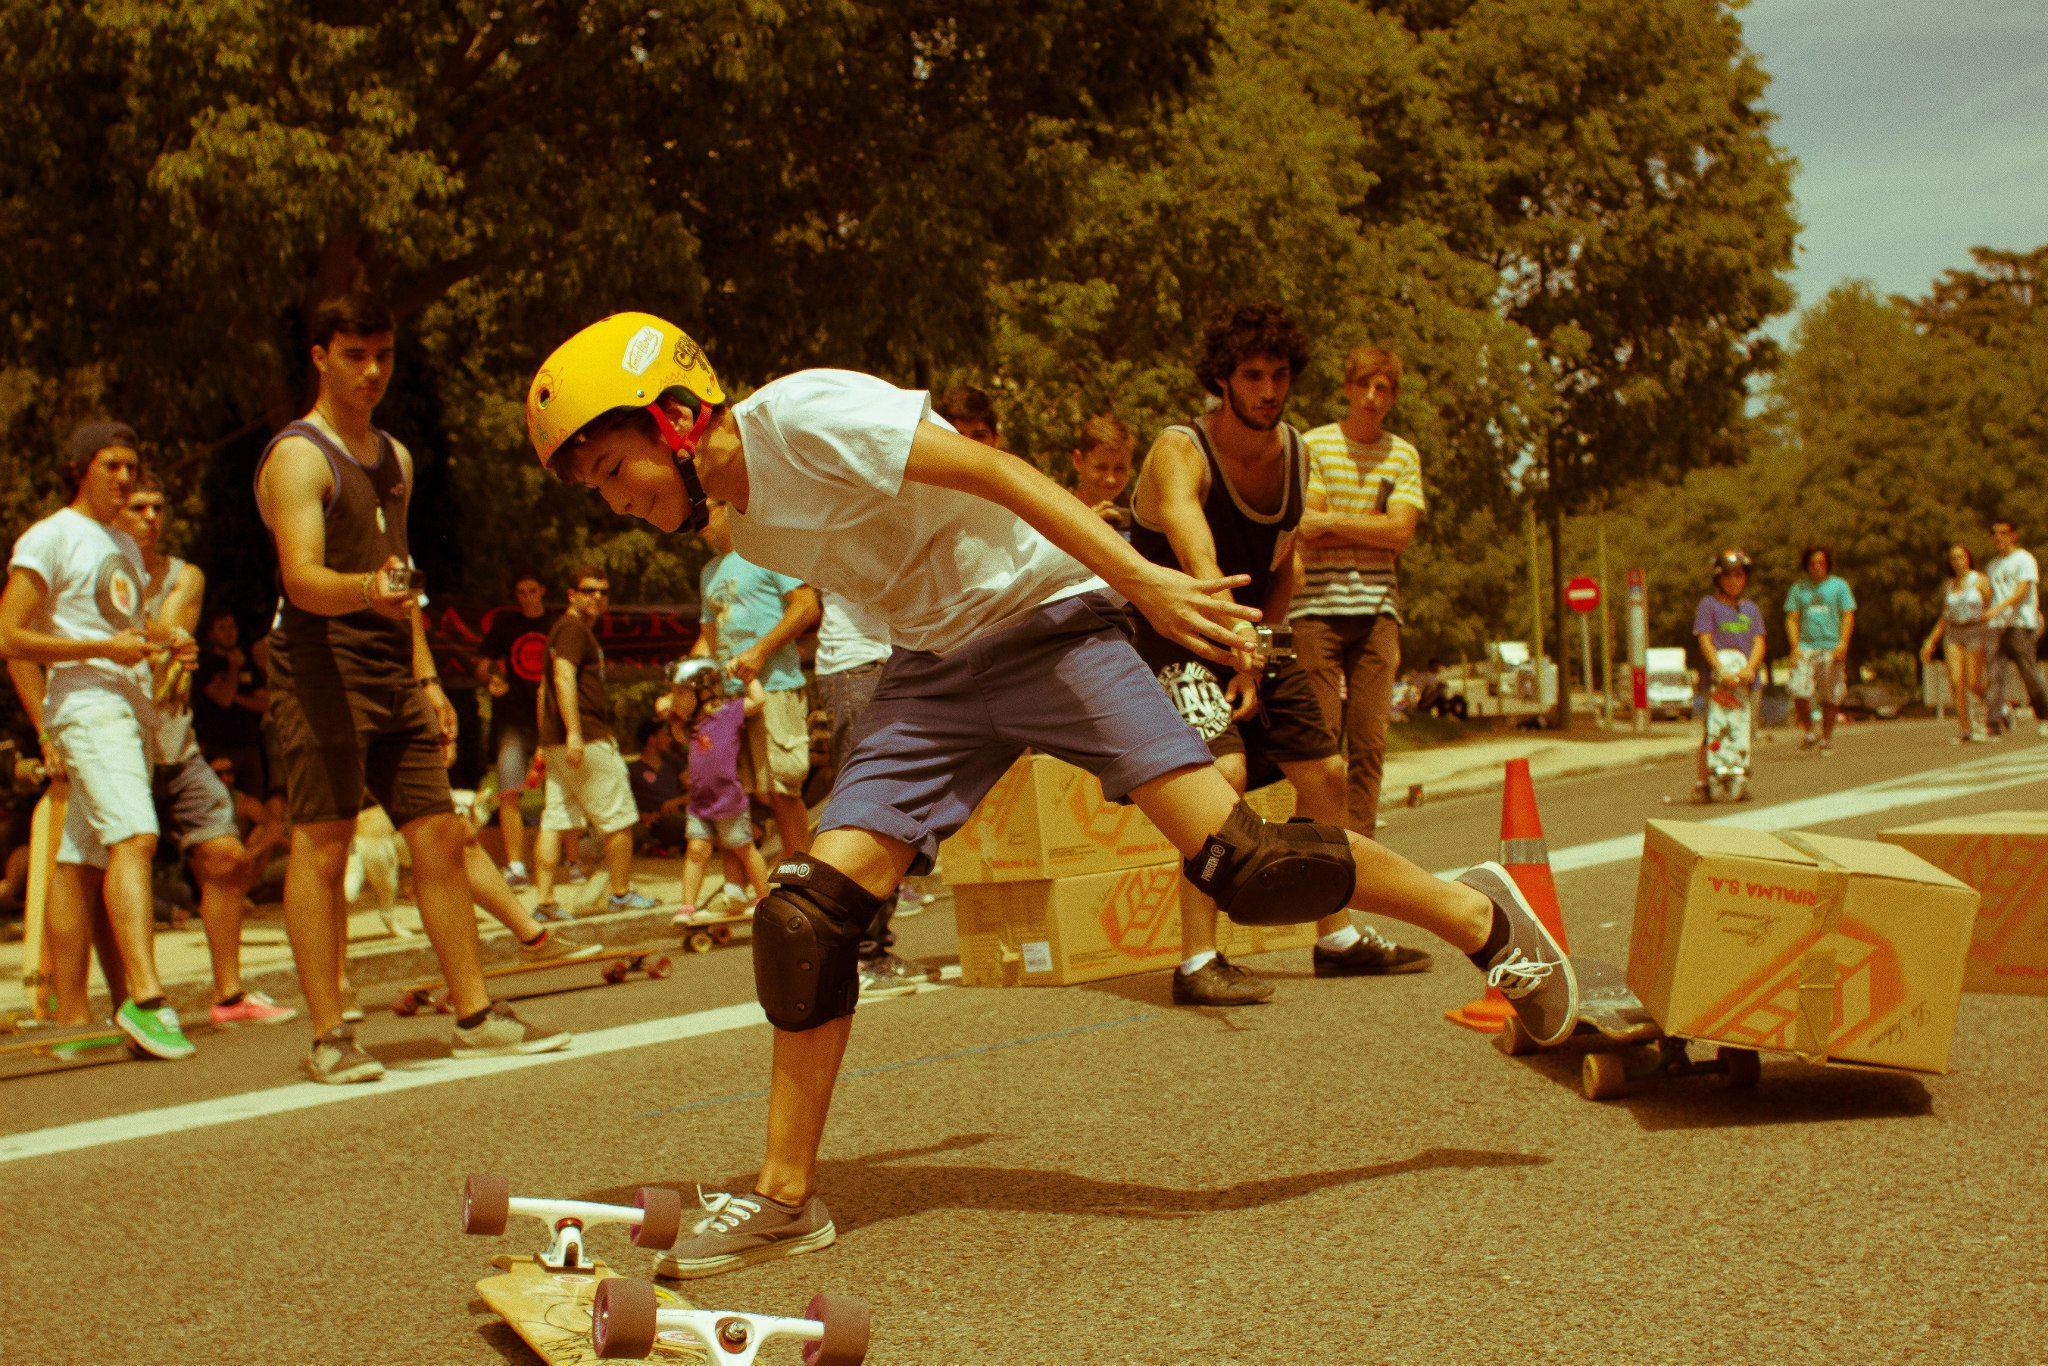 Skater levantándose tras caer.